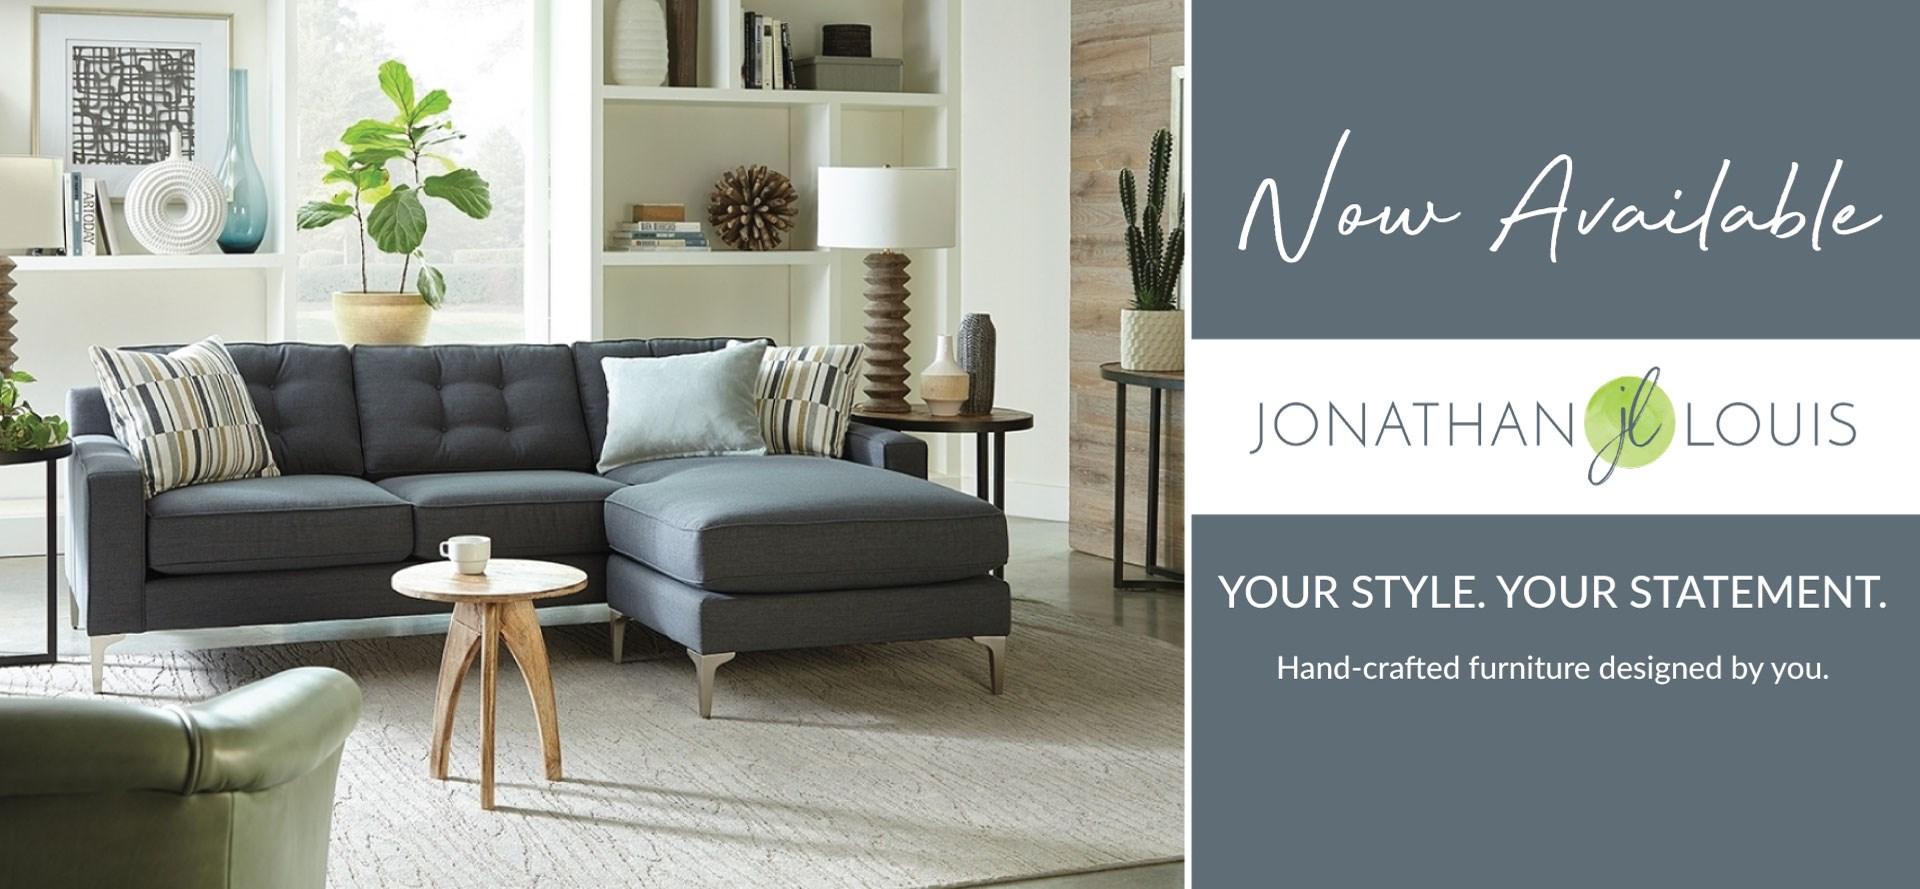 Jonathan Louis - Coming Soon